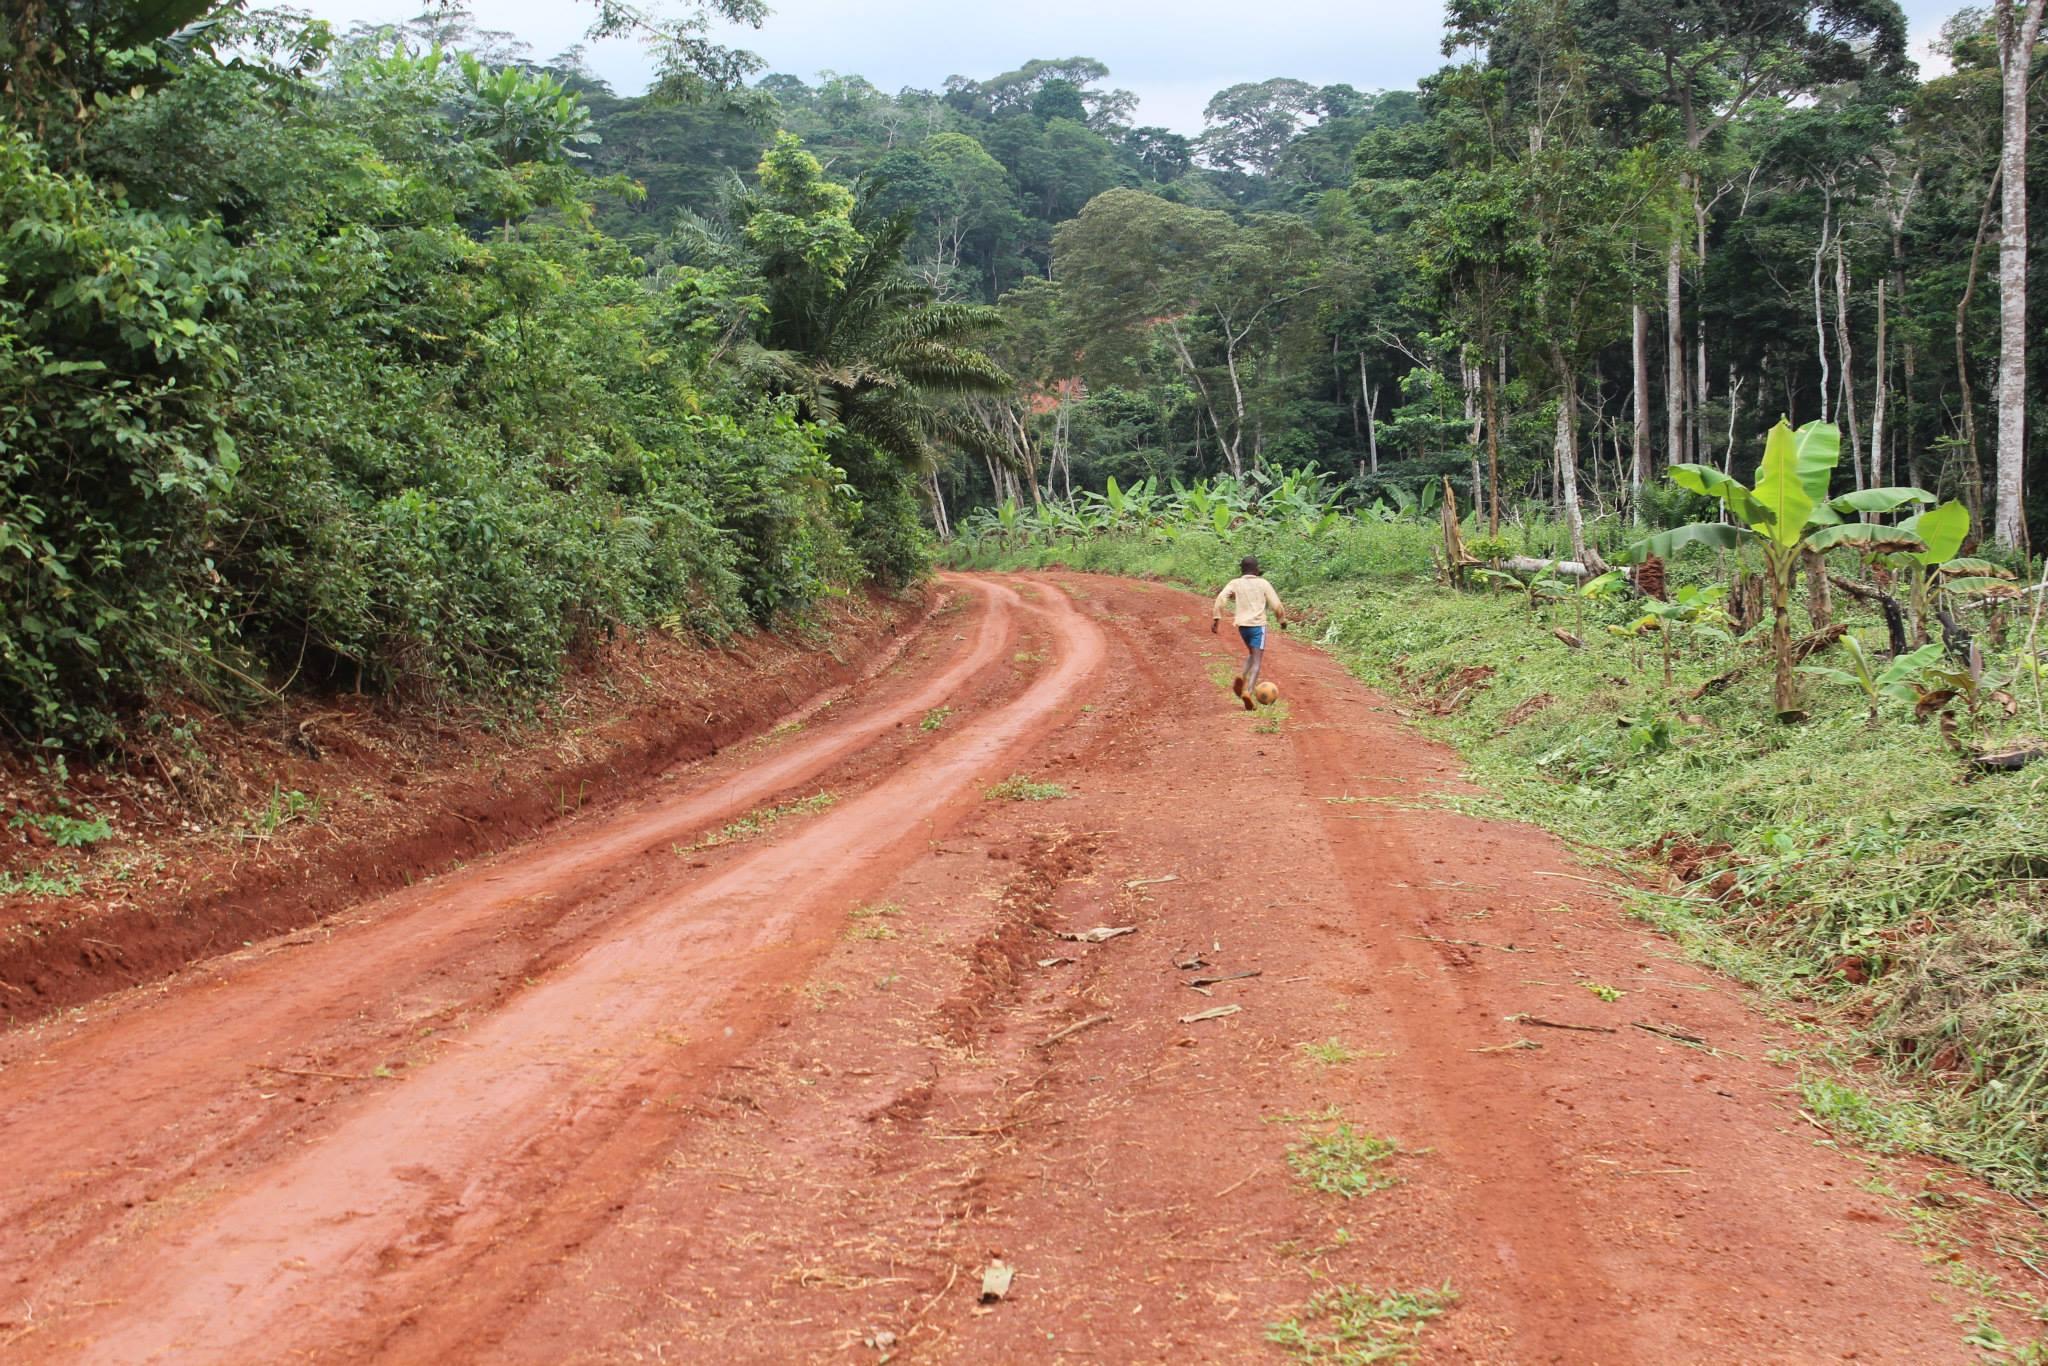 August 2014 Bizouk Cameroon